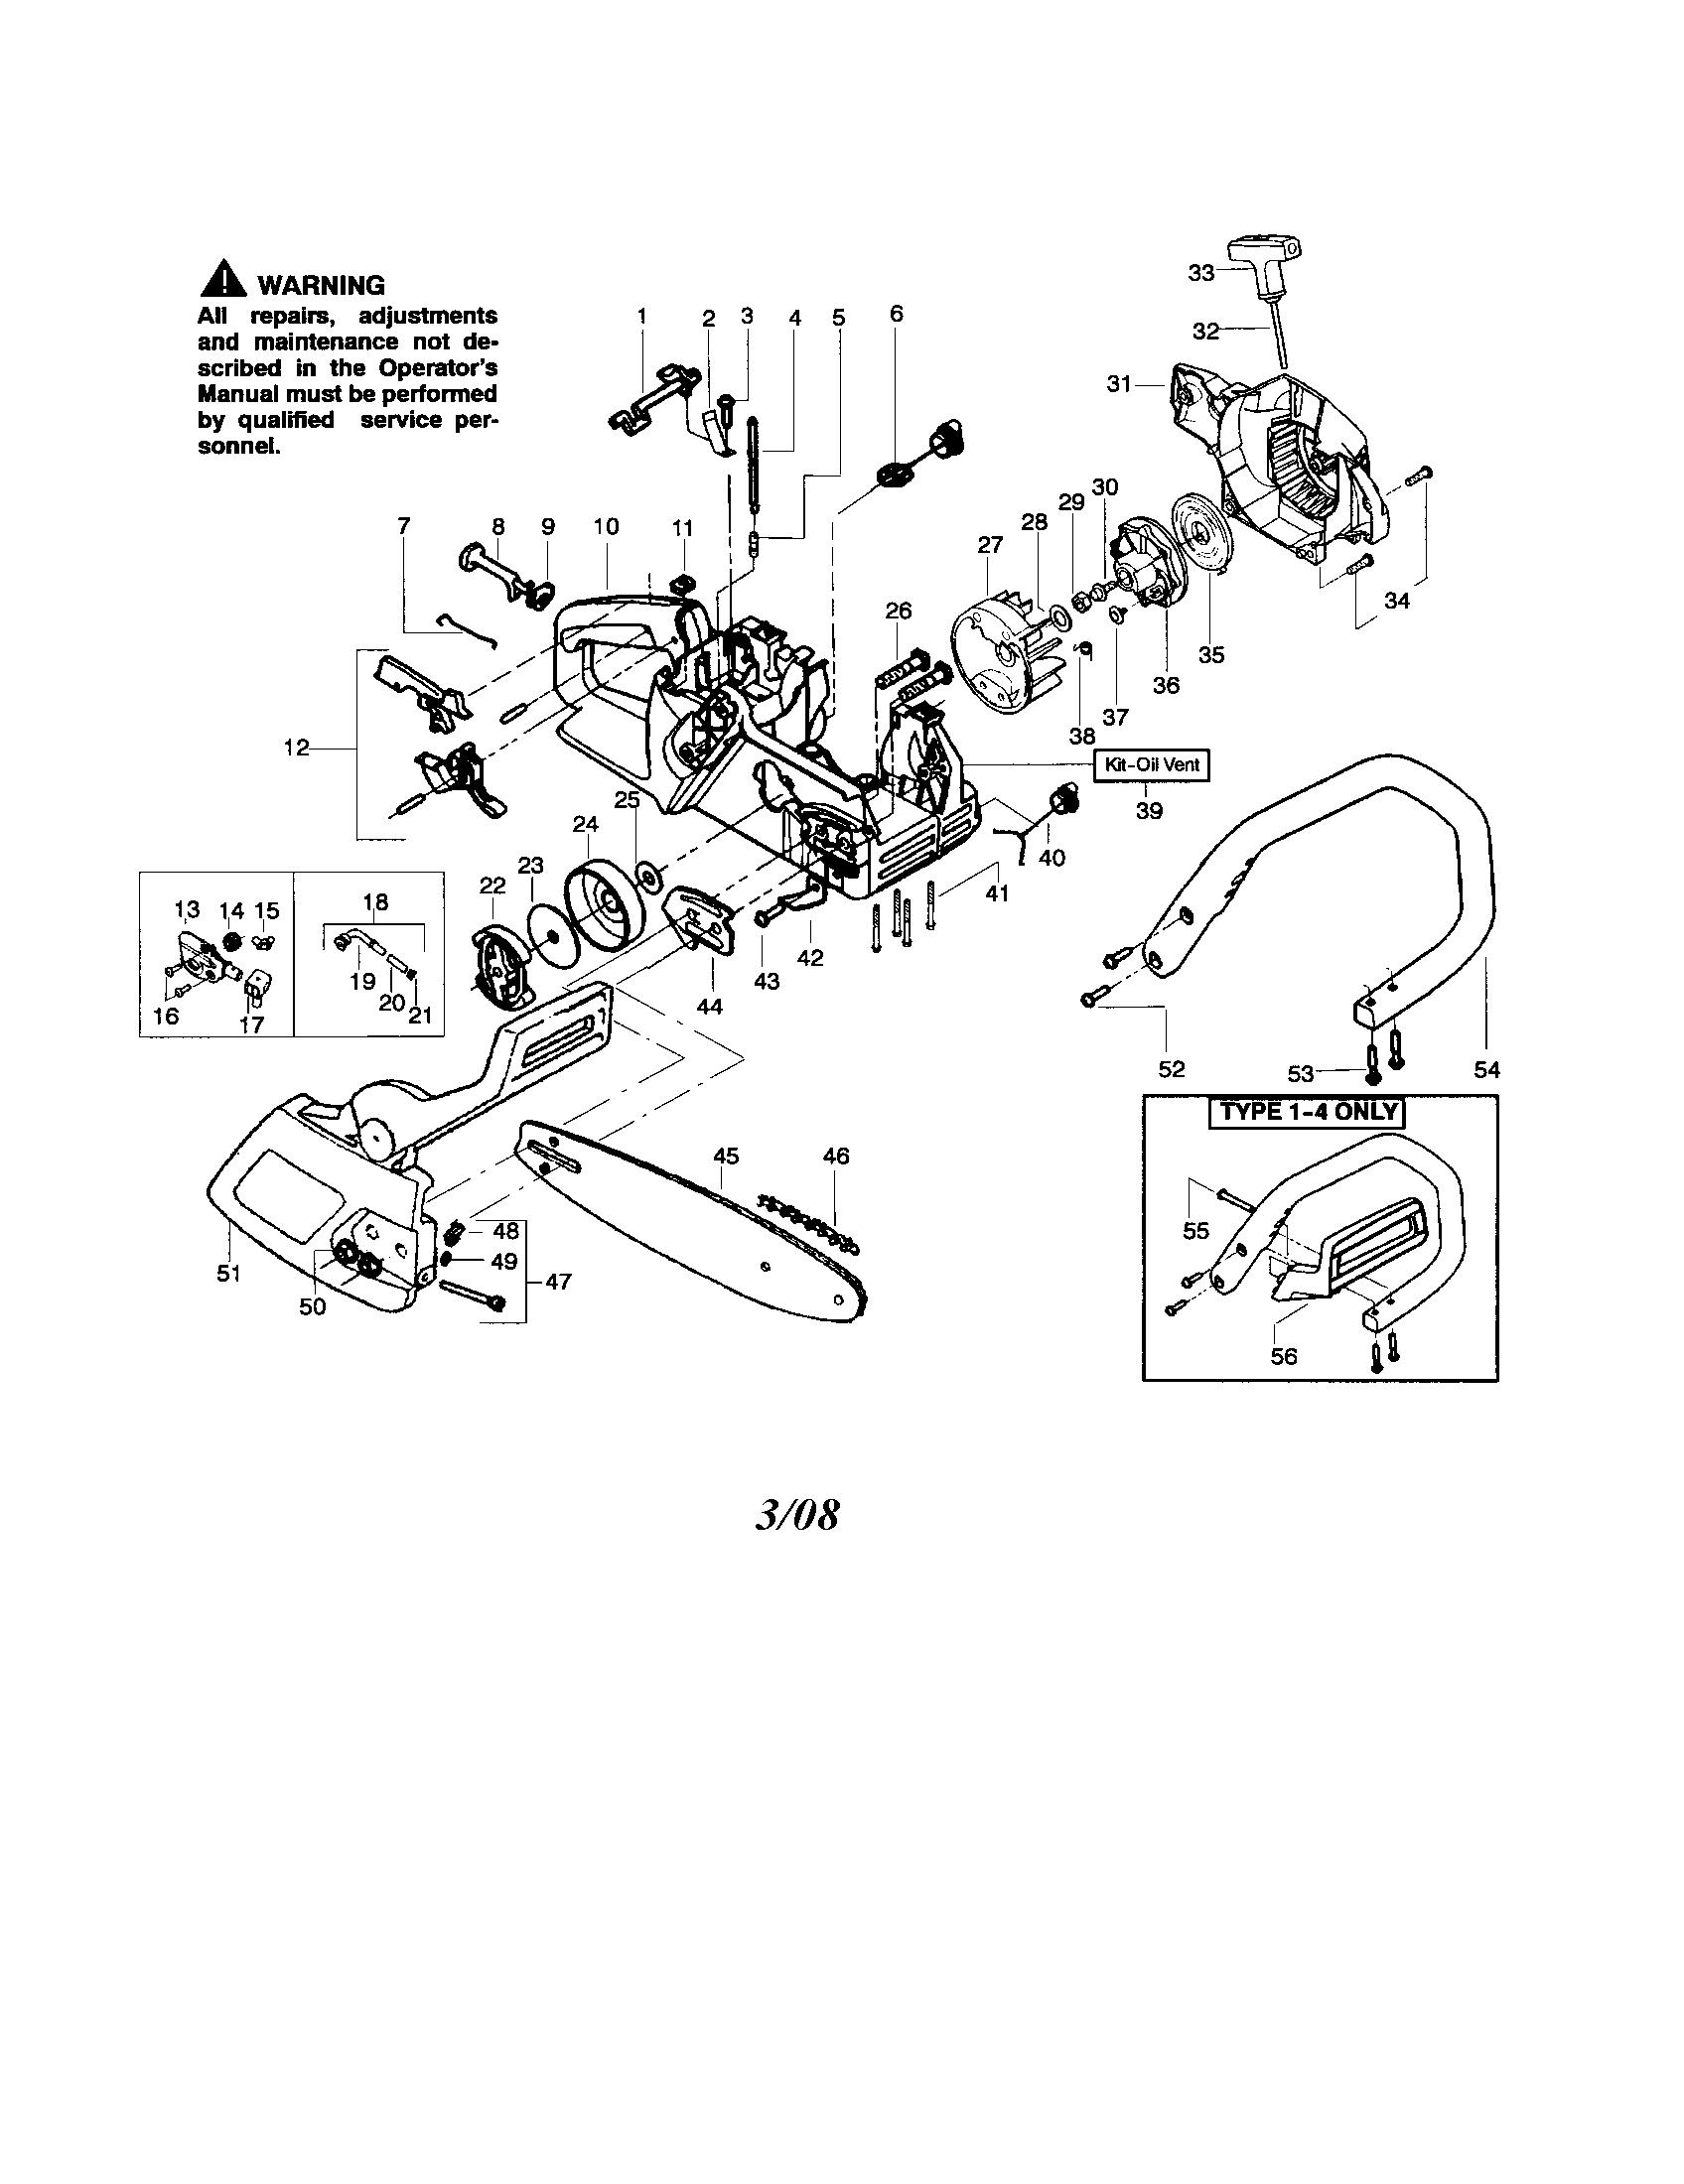 poulan model 1950 type 6 chainsaw gas genuine parts rh searspartsdirect com poulan woodshark 1950 owners manual Poulan Woodshark Spark Plug